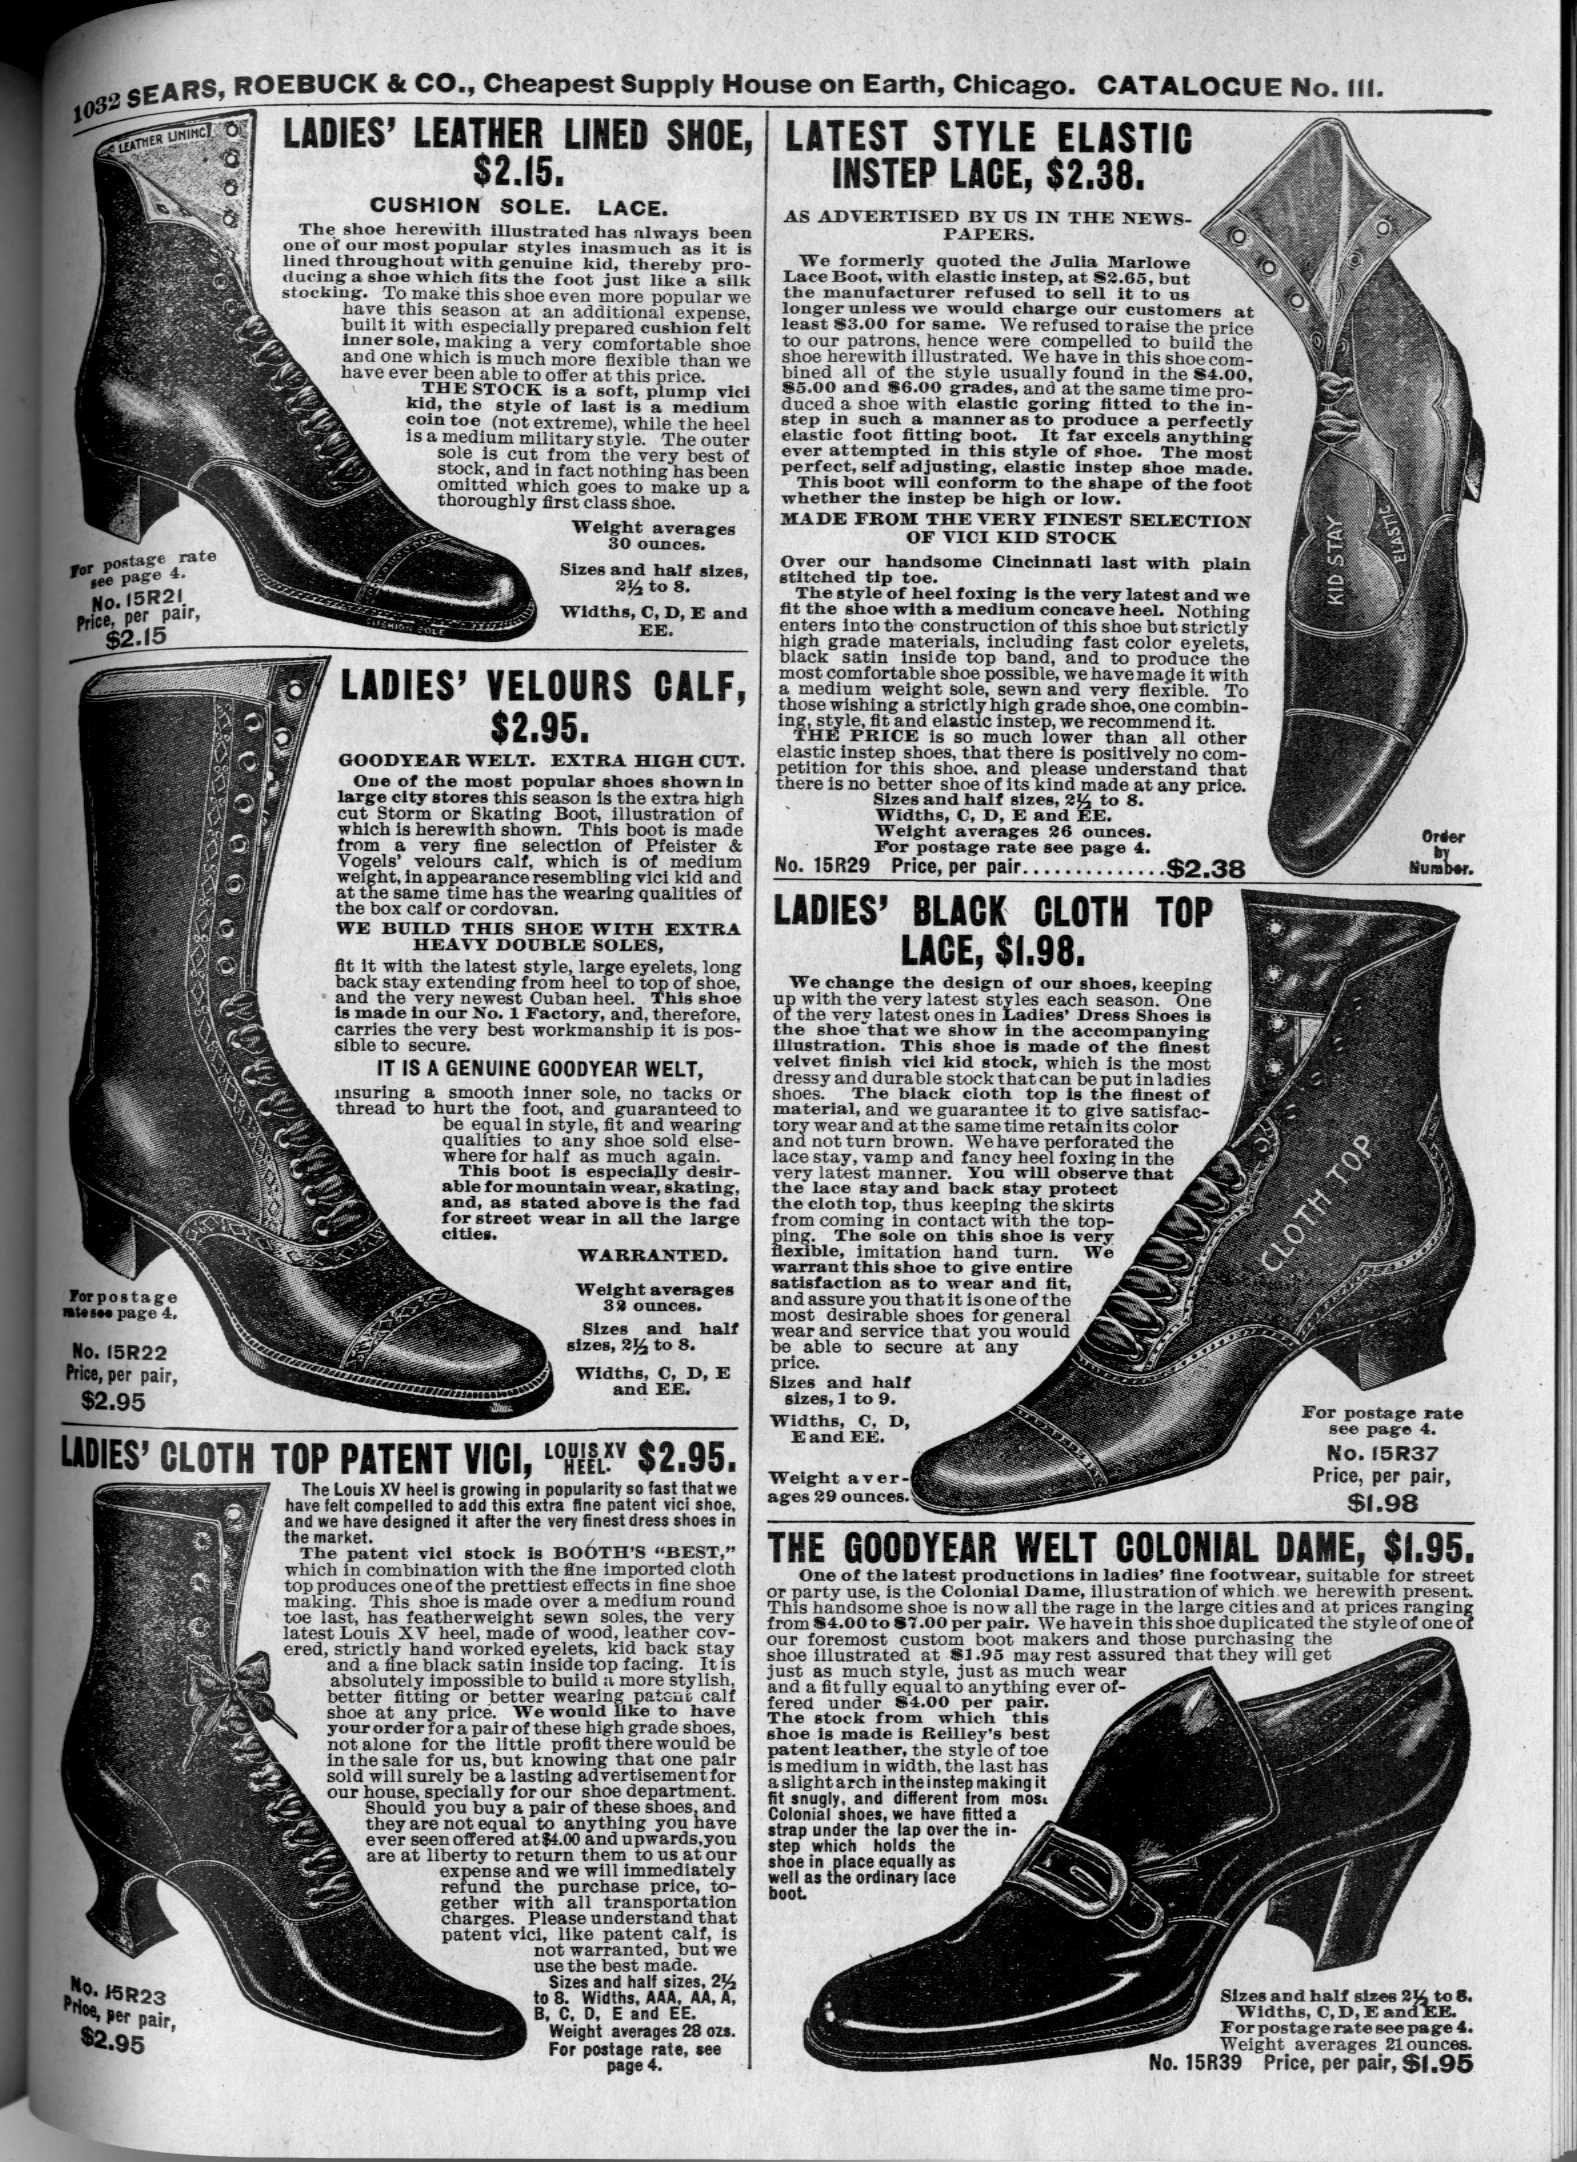 fa4e81042e4 Ladies' Boots and Shoes, Sears Roebuck Catalog 1902 | 1900s ...